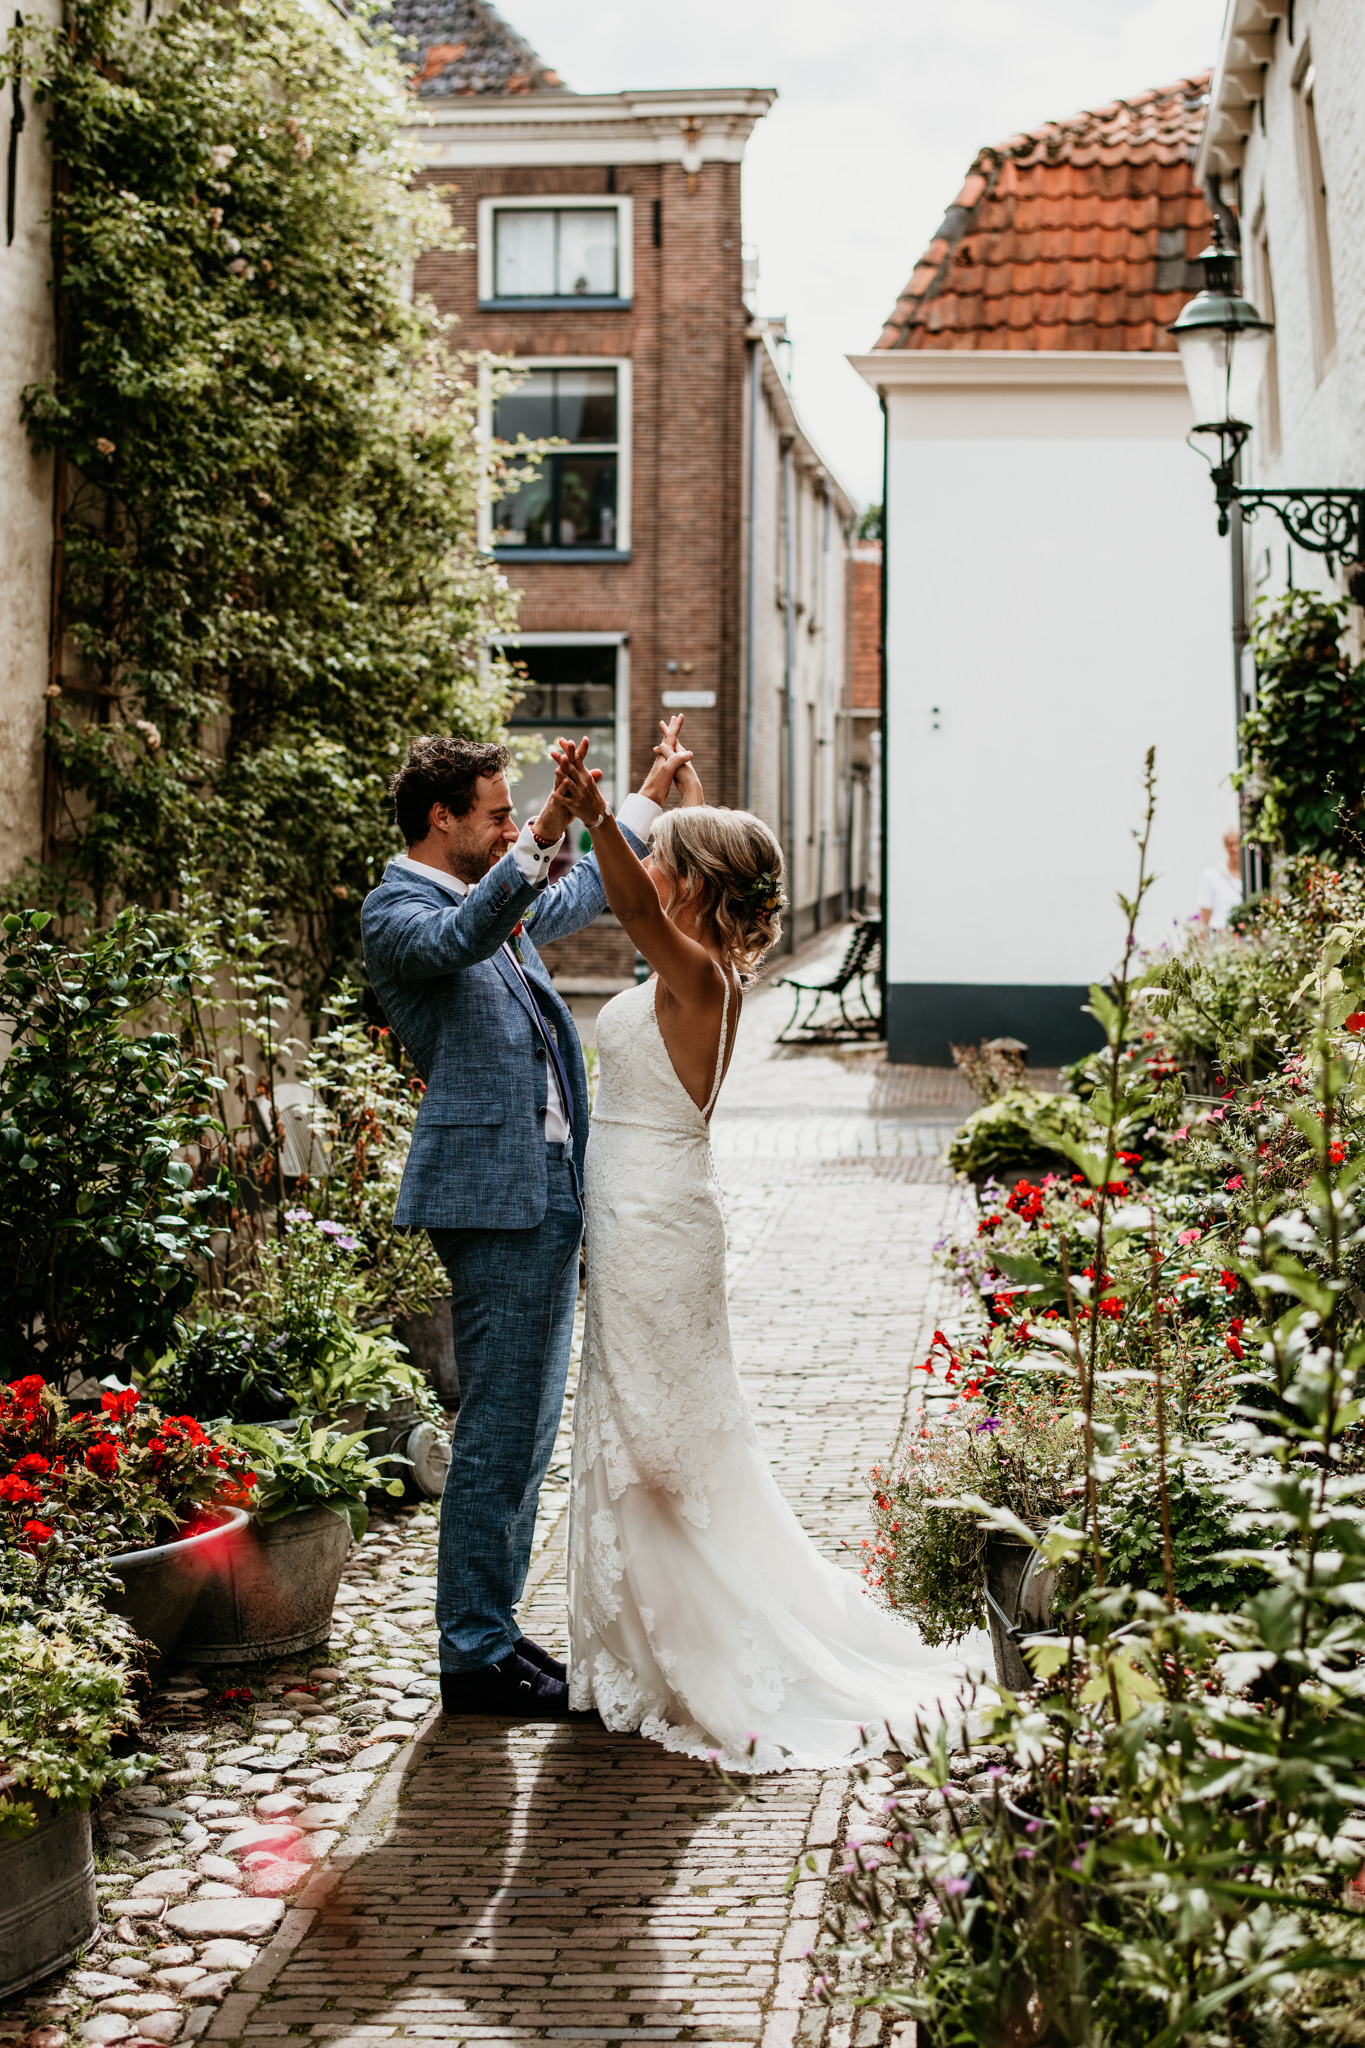 Trouwfotograaf herberg molecaten Hattem Zwolle